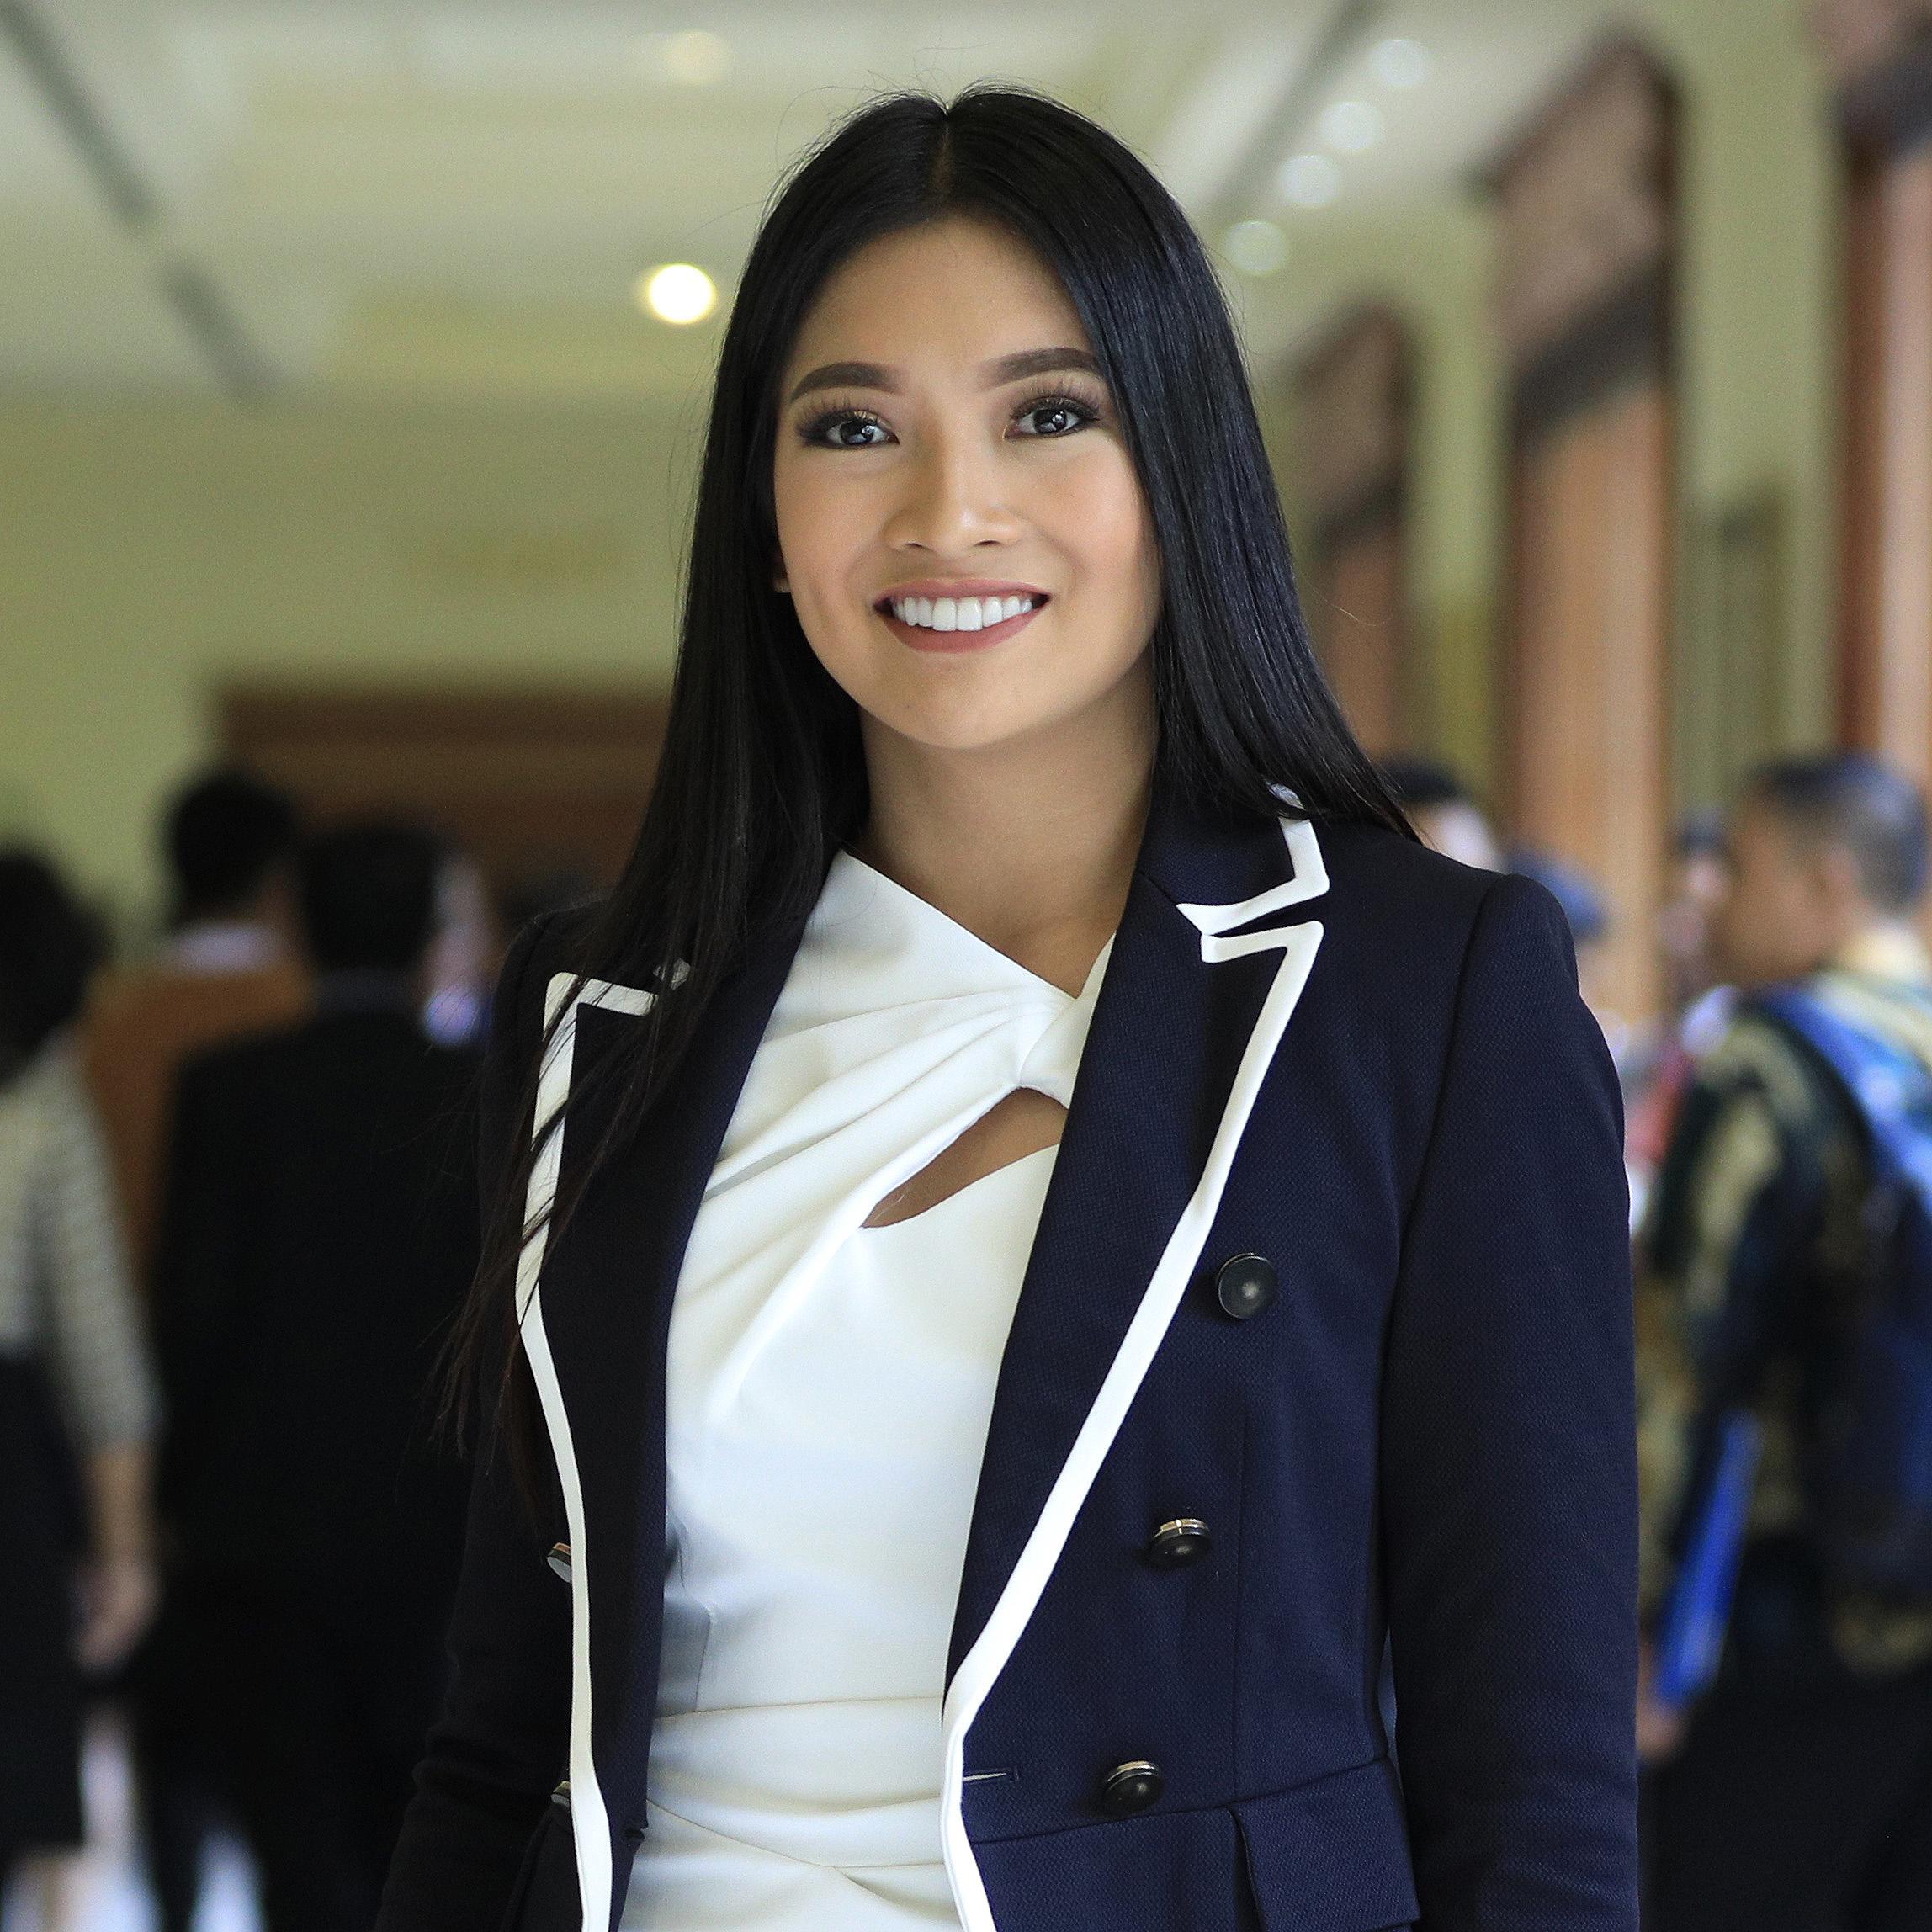 Profil Model Anindya Kusuma Putri, Model Cantik dengan Segudang Prestasi Olahraga